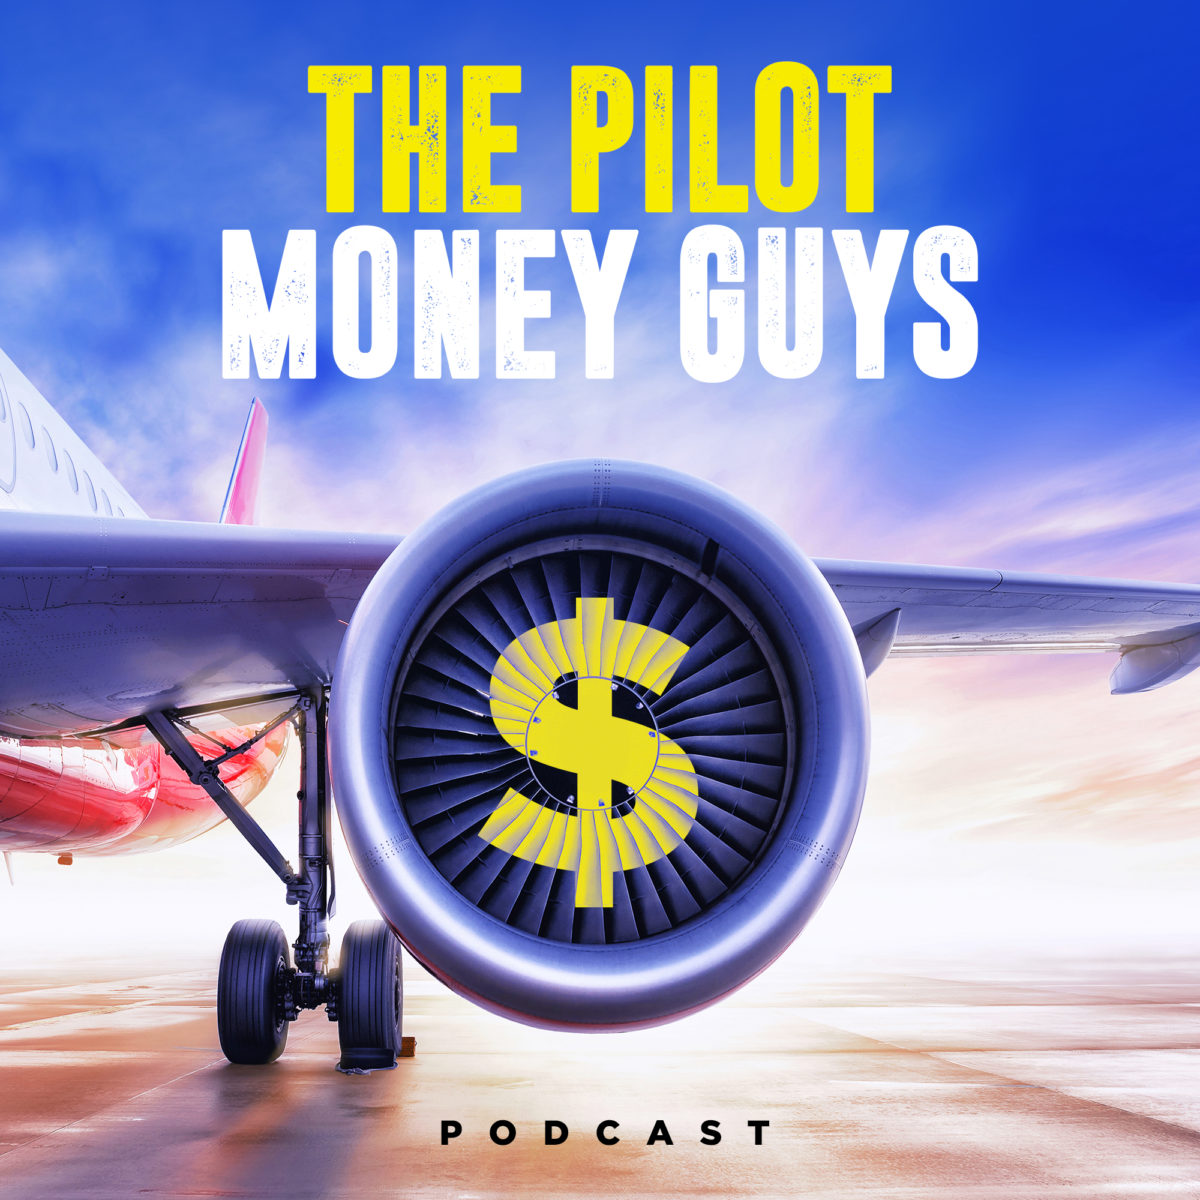 The Pilot Money Guys podcast